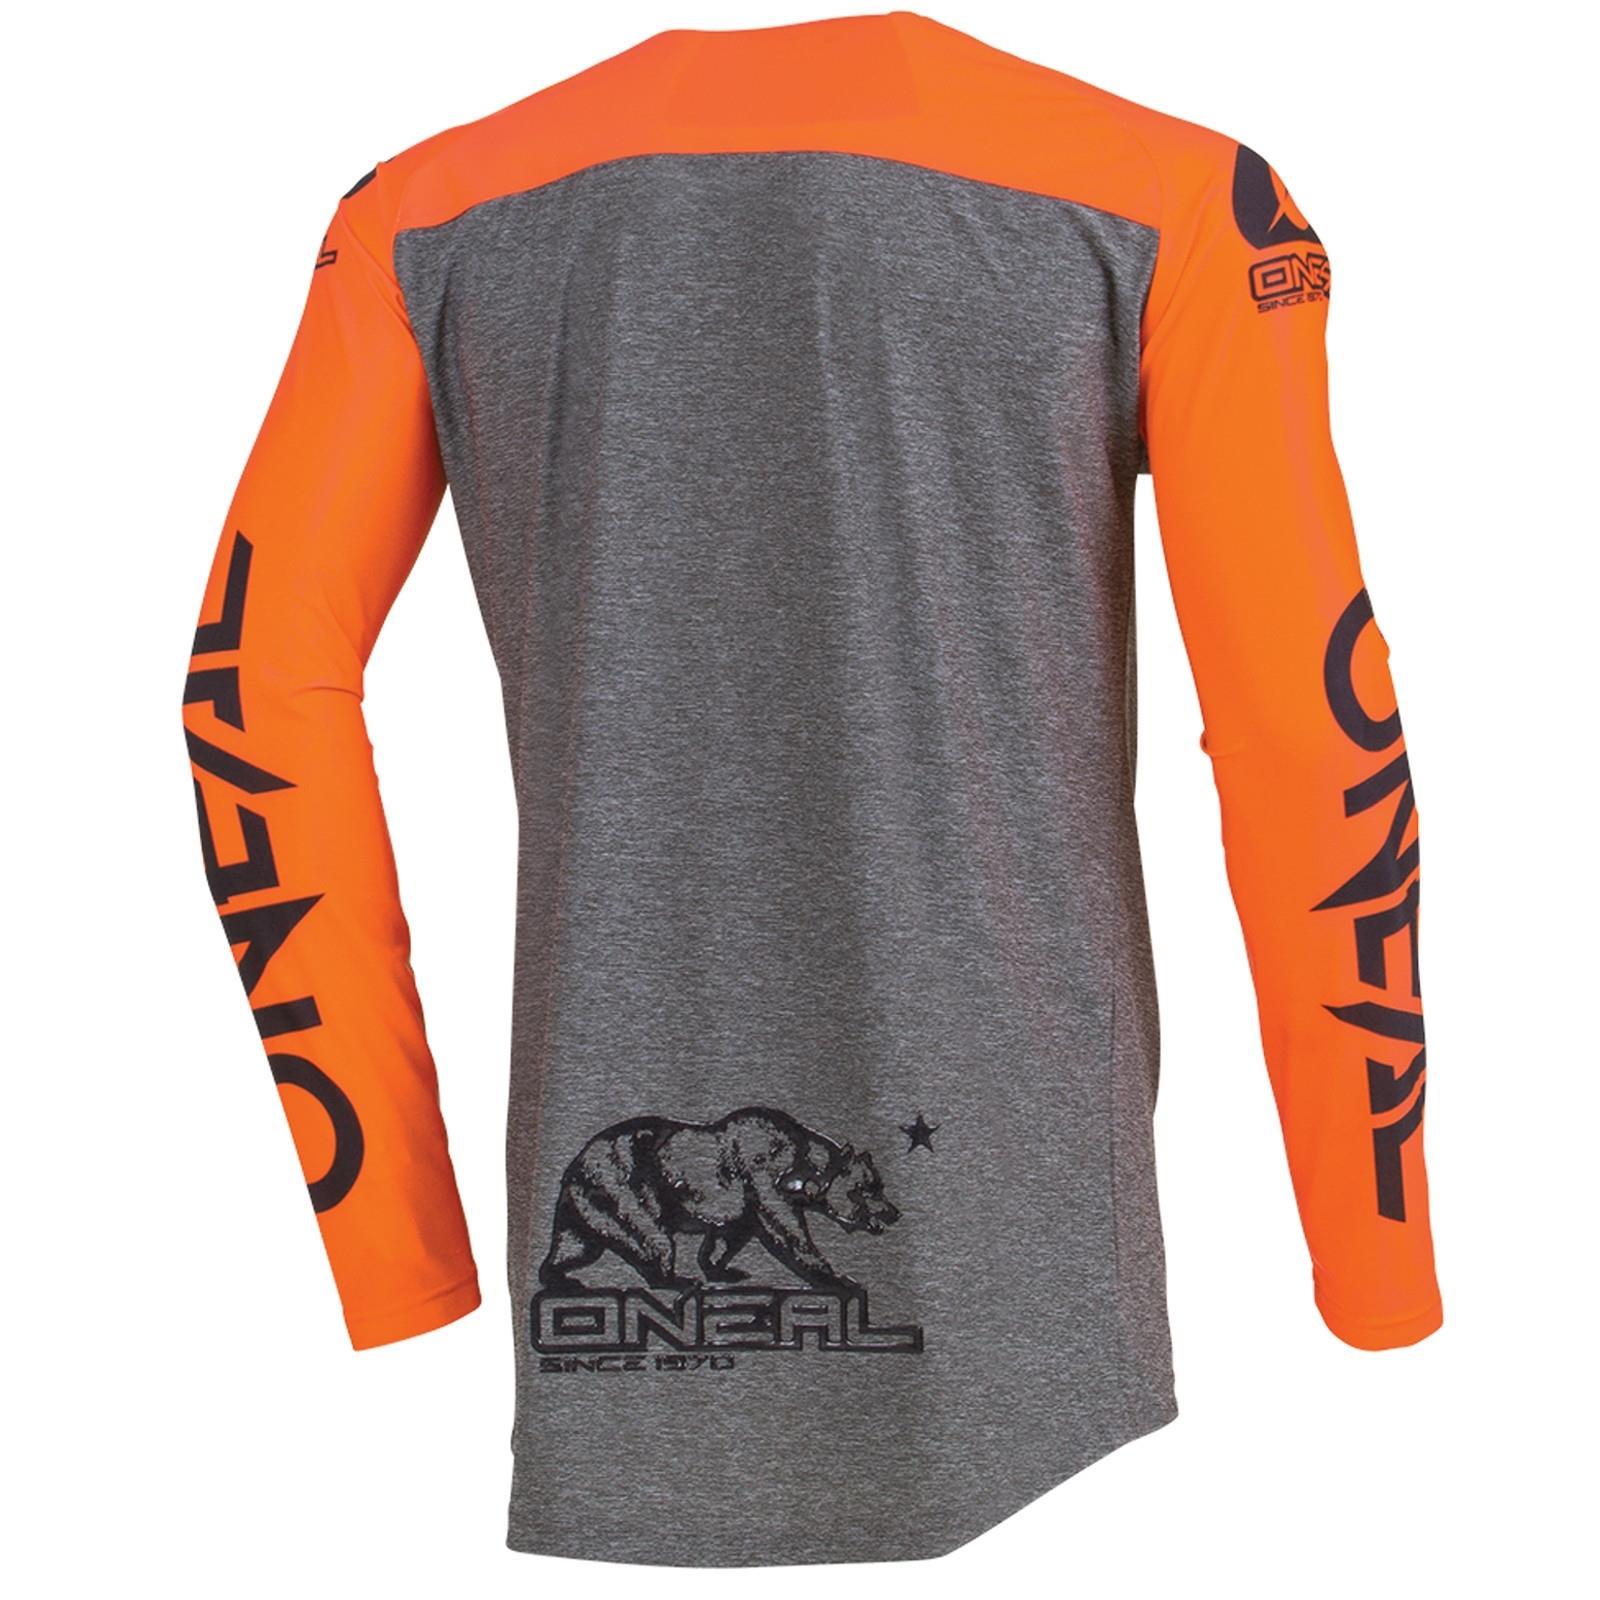 O-039-Neal-elemento-Mayhem-JERSEY-Racewear-Motocross-Maglia-MX-DH-FR-MTB-MOUNTAIN-BIKE miniatura 46